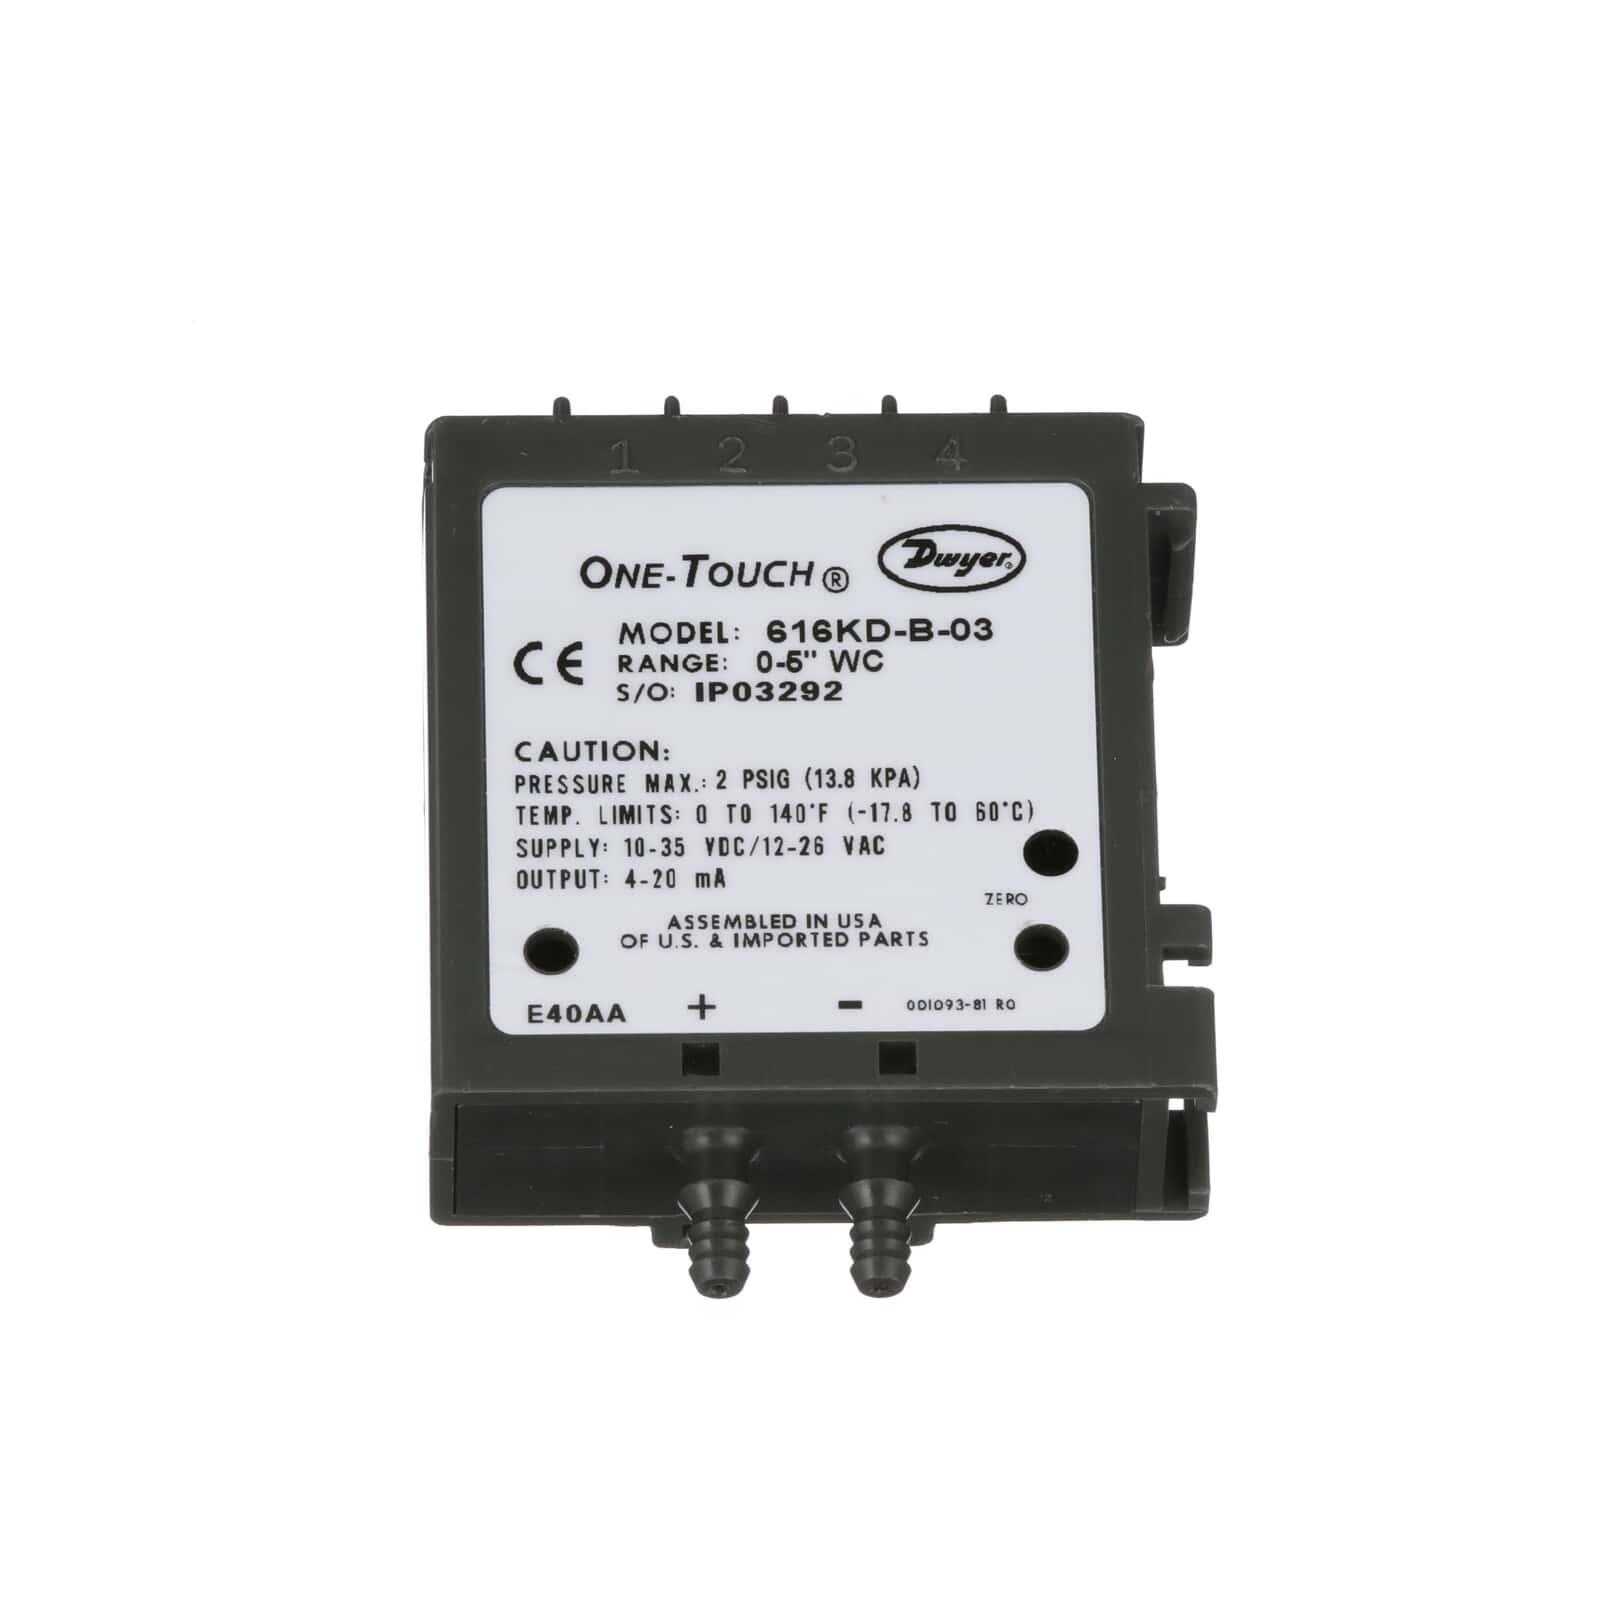 Series 616kd Differential Pressure Transmitter Dwyer Instruments Optical Sensorworkingconstructioncircuit Diagram Swipe To Spin